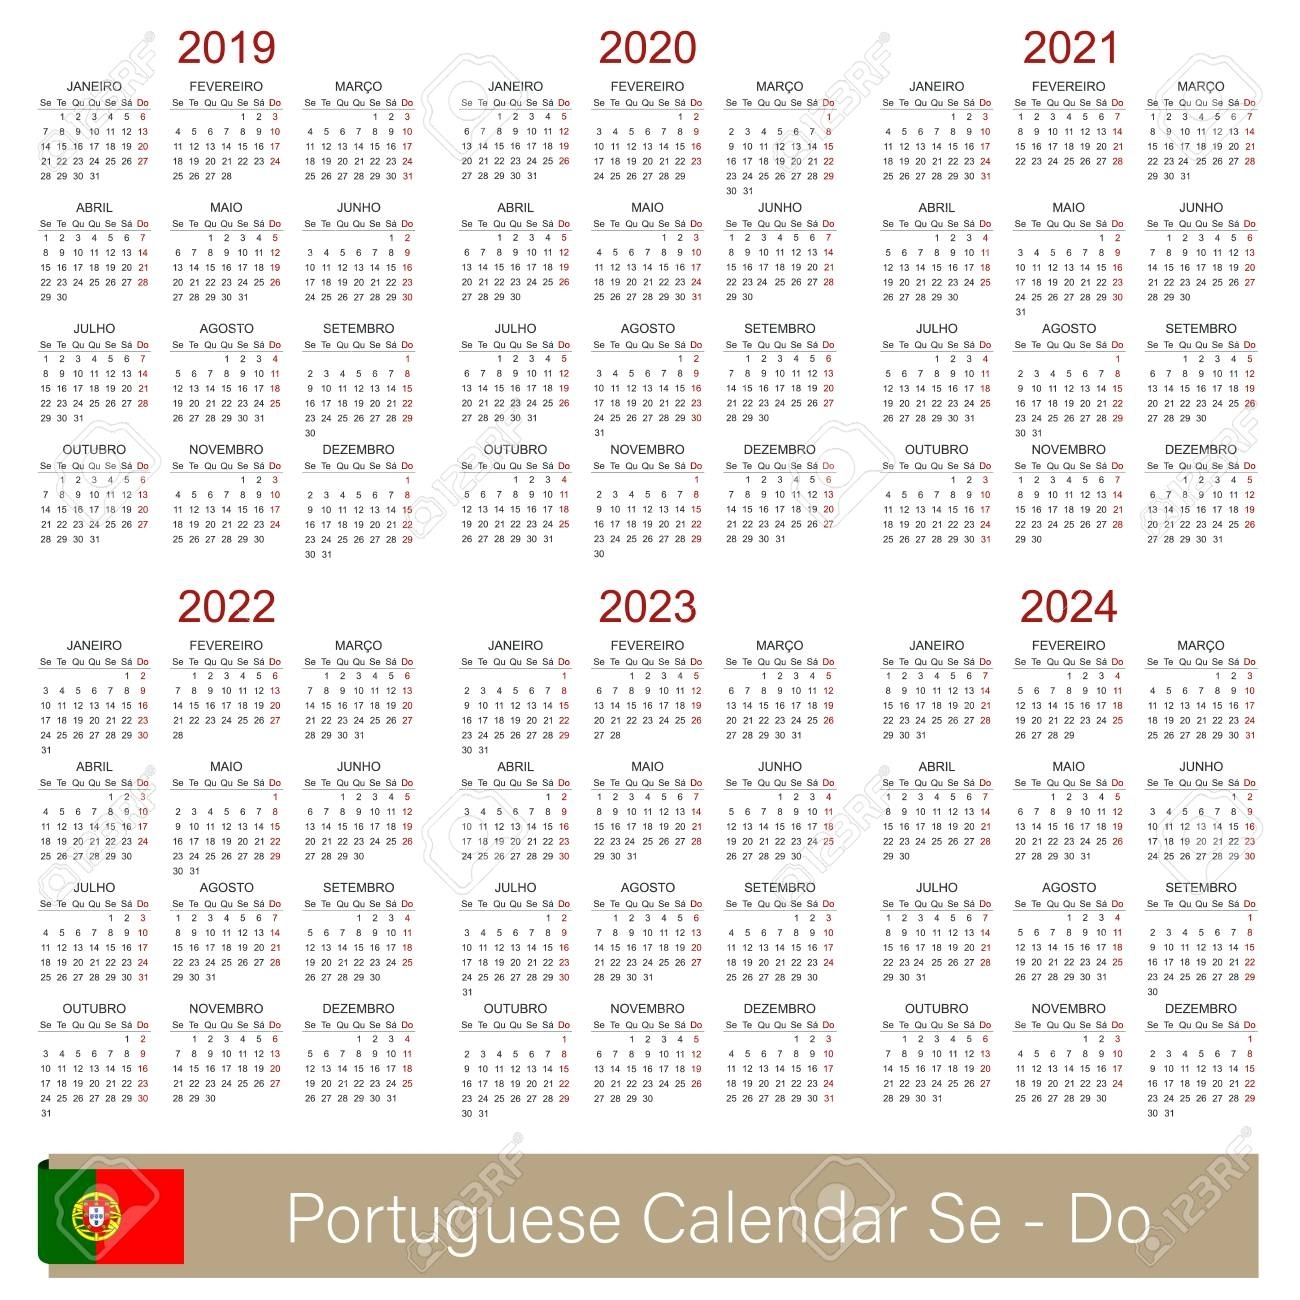 Portuguese Calendar 2019 - 2024, Week Starts On Monday, Simple regarding Free Prinable Calenders 2020 To 2023